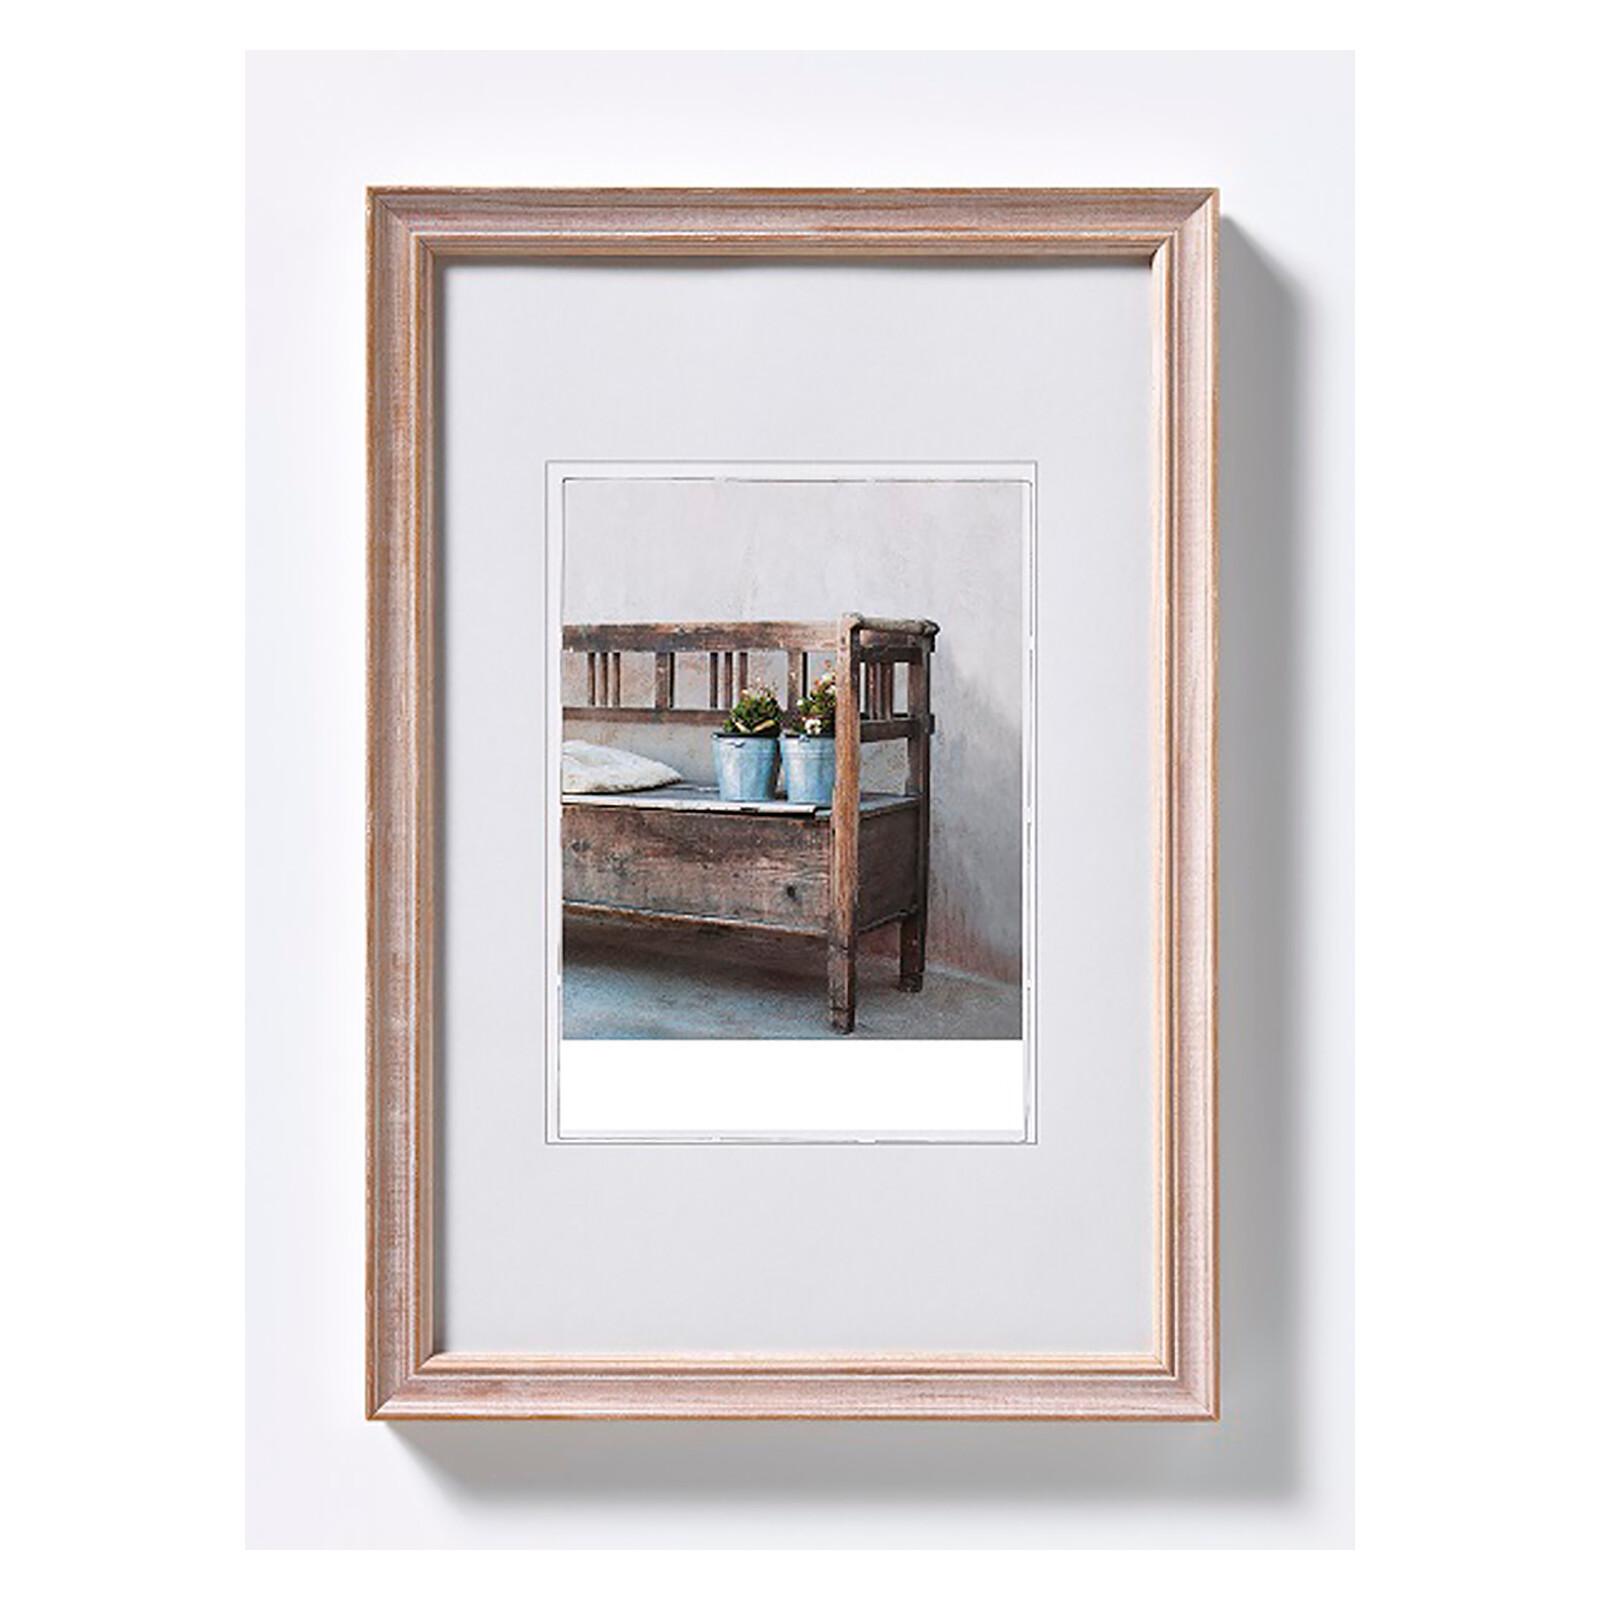 Bilderrahmen Bench 15x20cm Holz braun